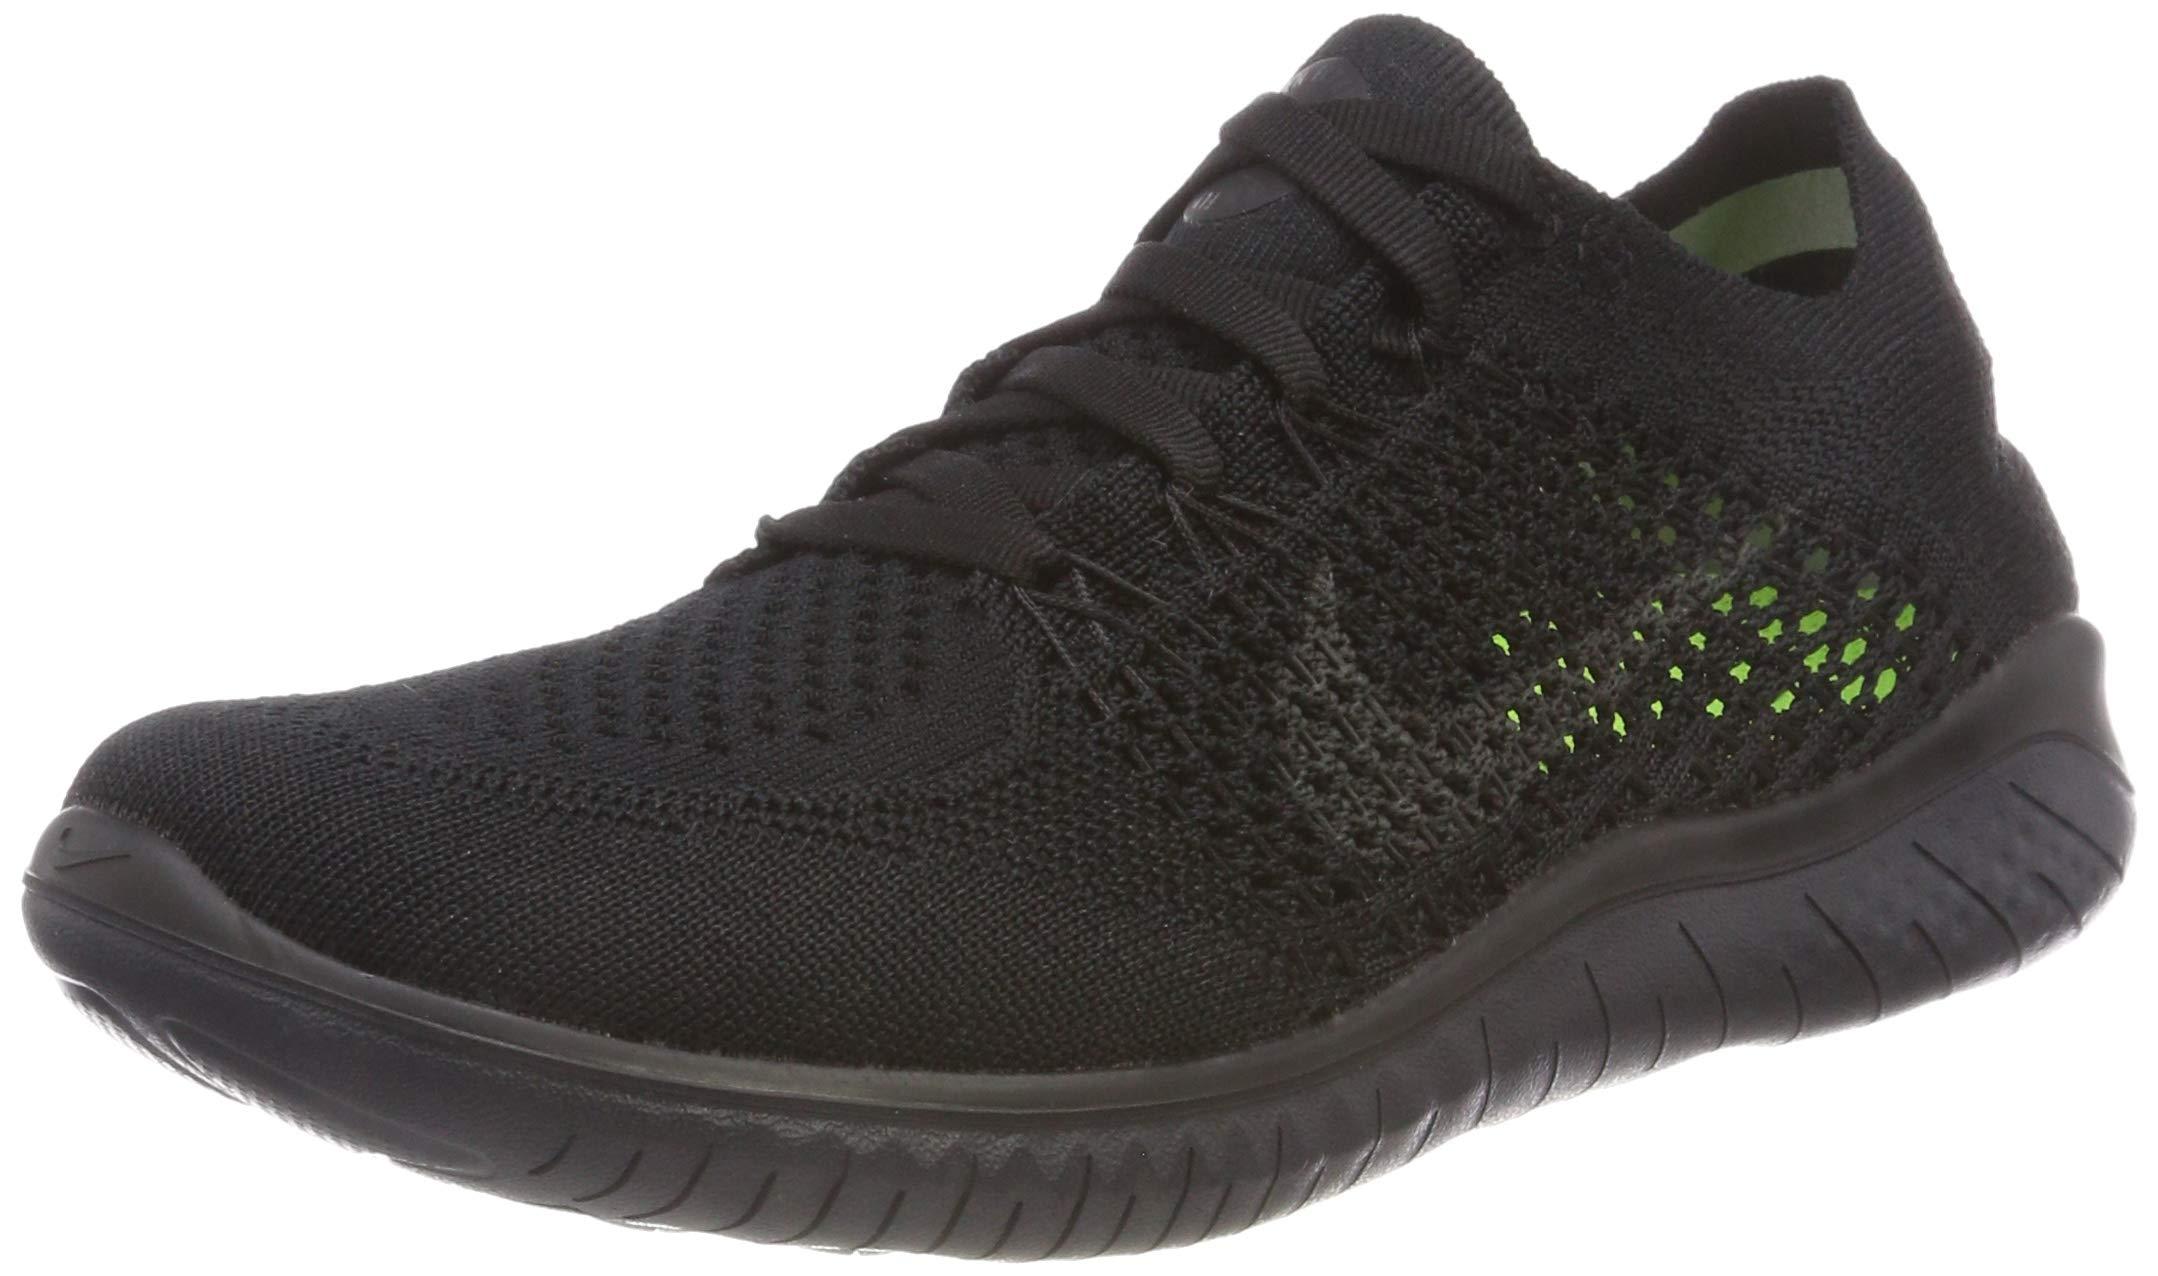 857ba98fdac0 Nike Women s Free Rn Flyknit 2018 Running Shoe nk942839 002 (9.5 B(M)